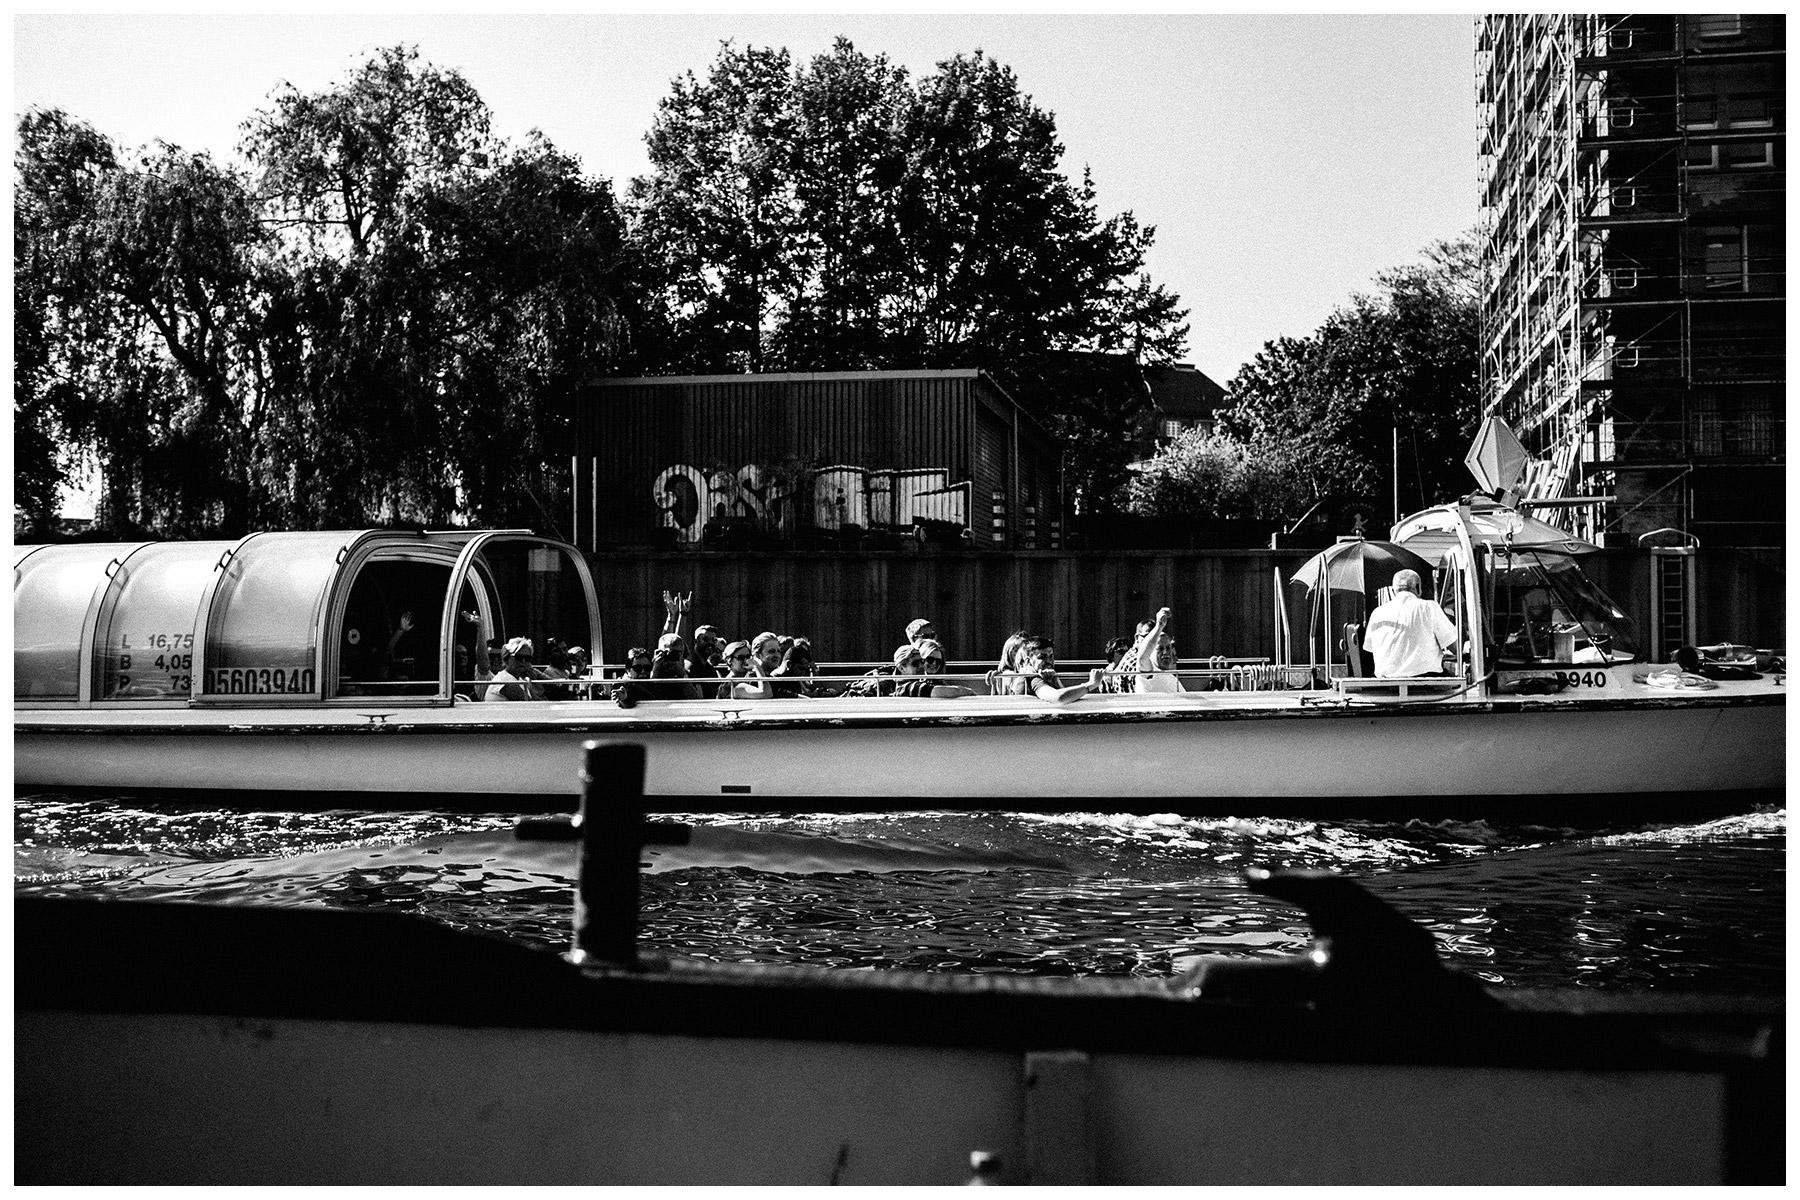 fotografie-sommer-urban-berlin-boots-tour